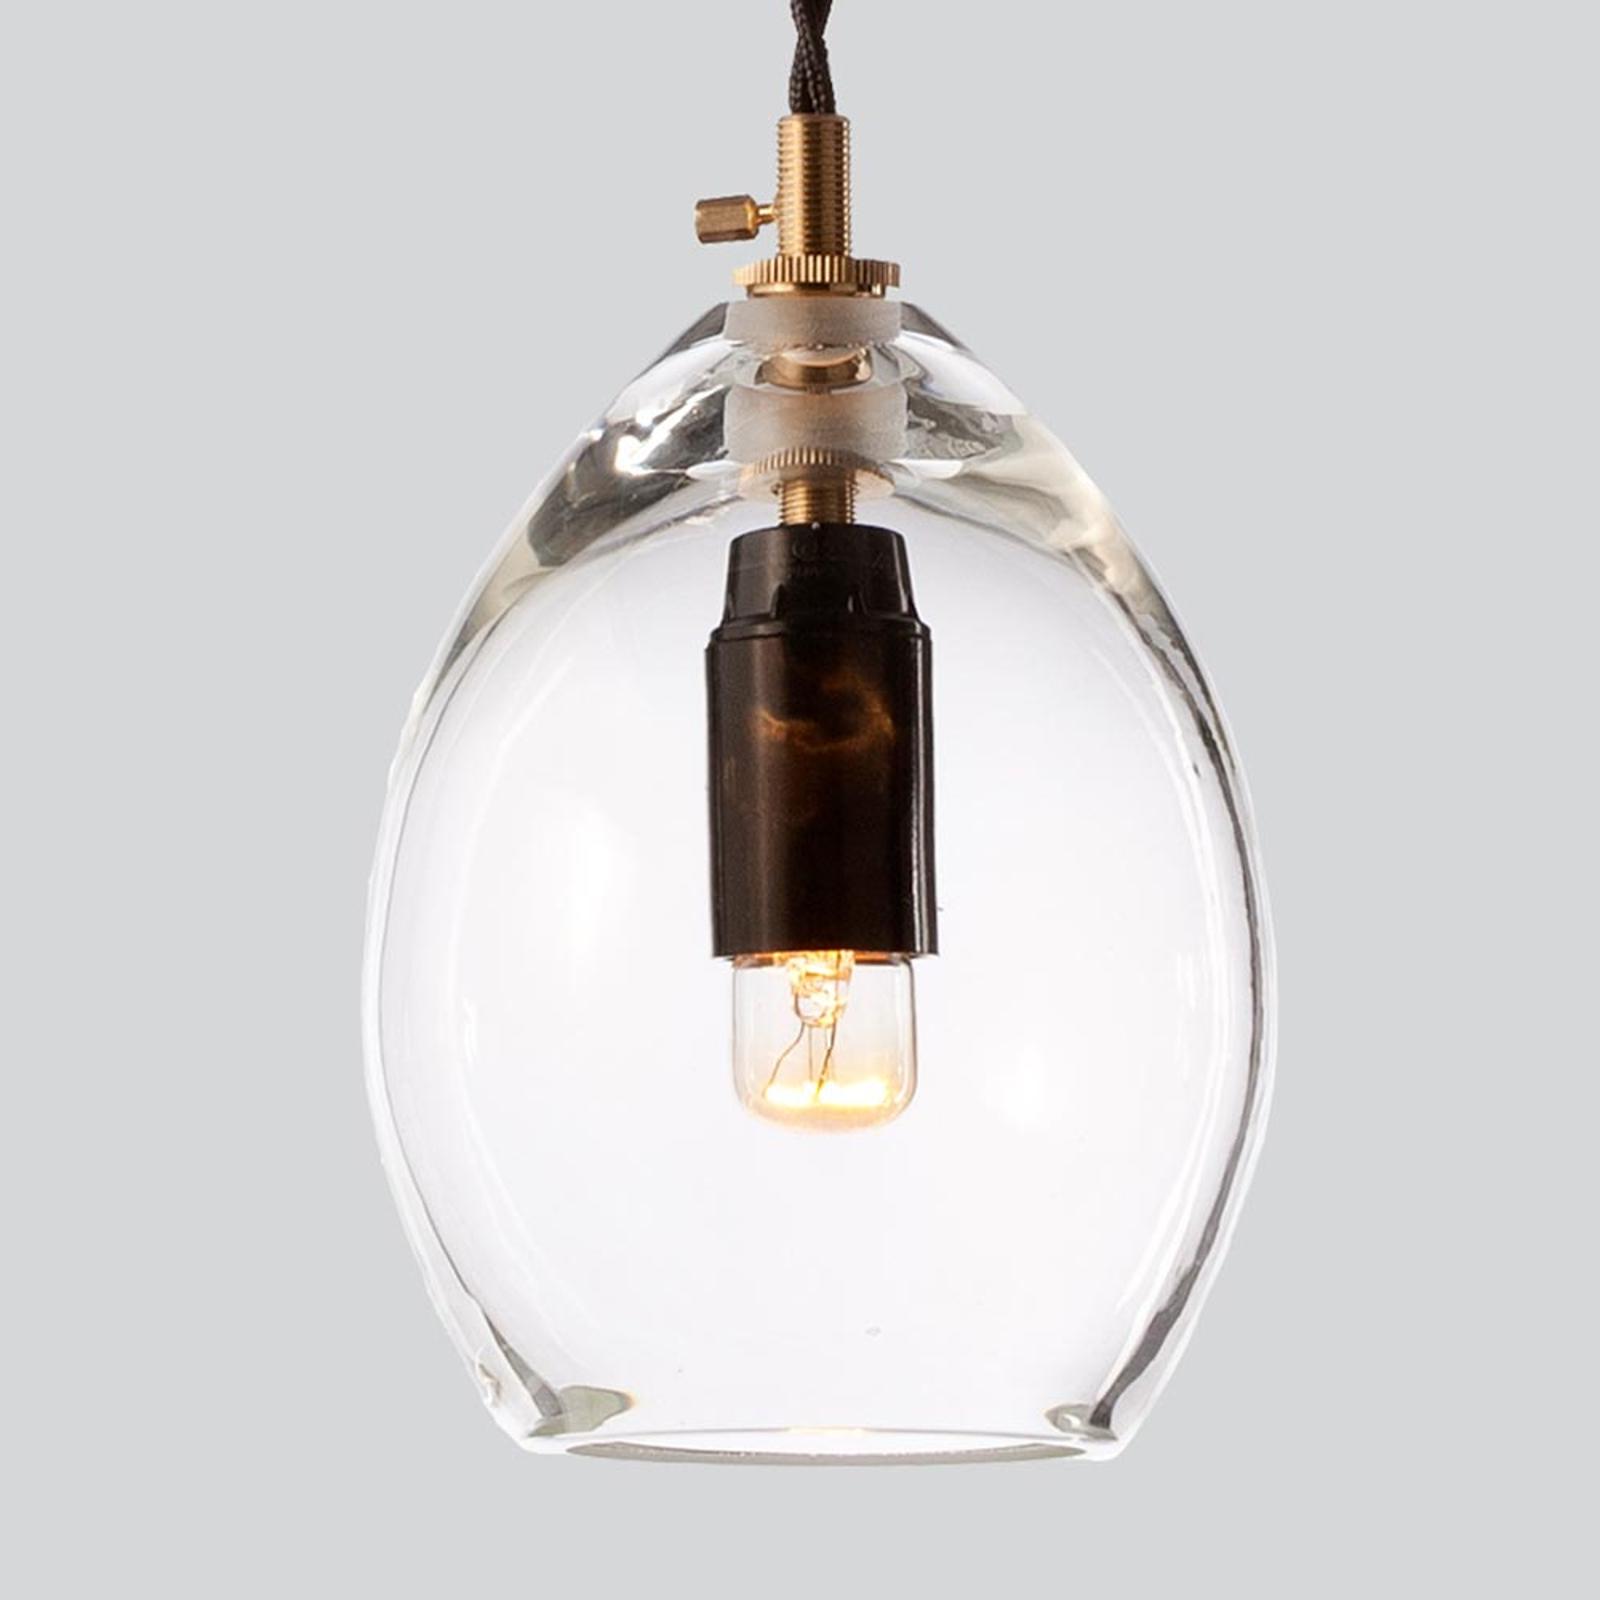 Kirkas design-lasiriippuvalaisin Unika, 10,5 cm